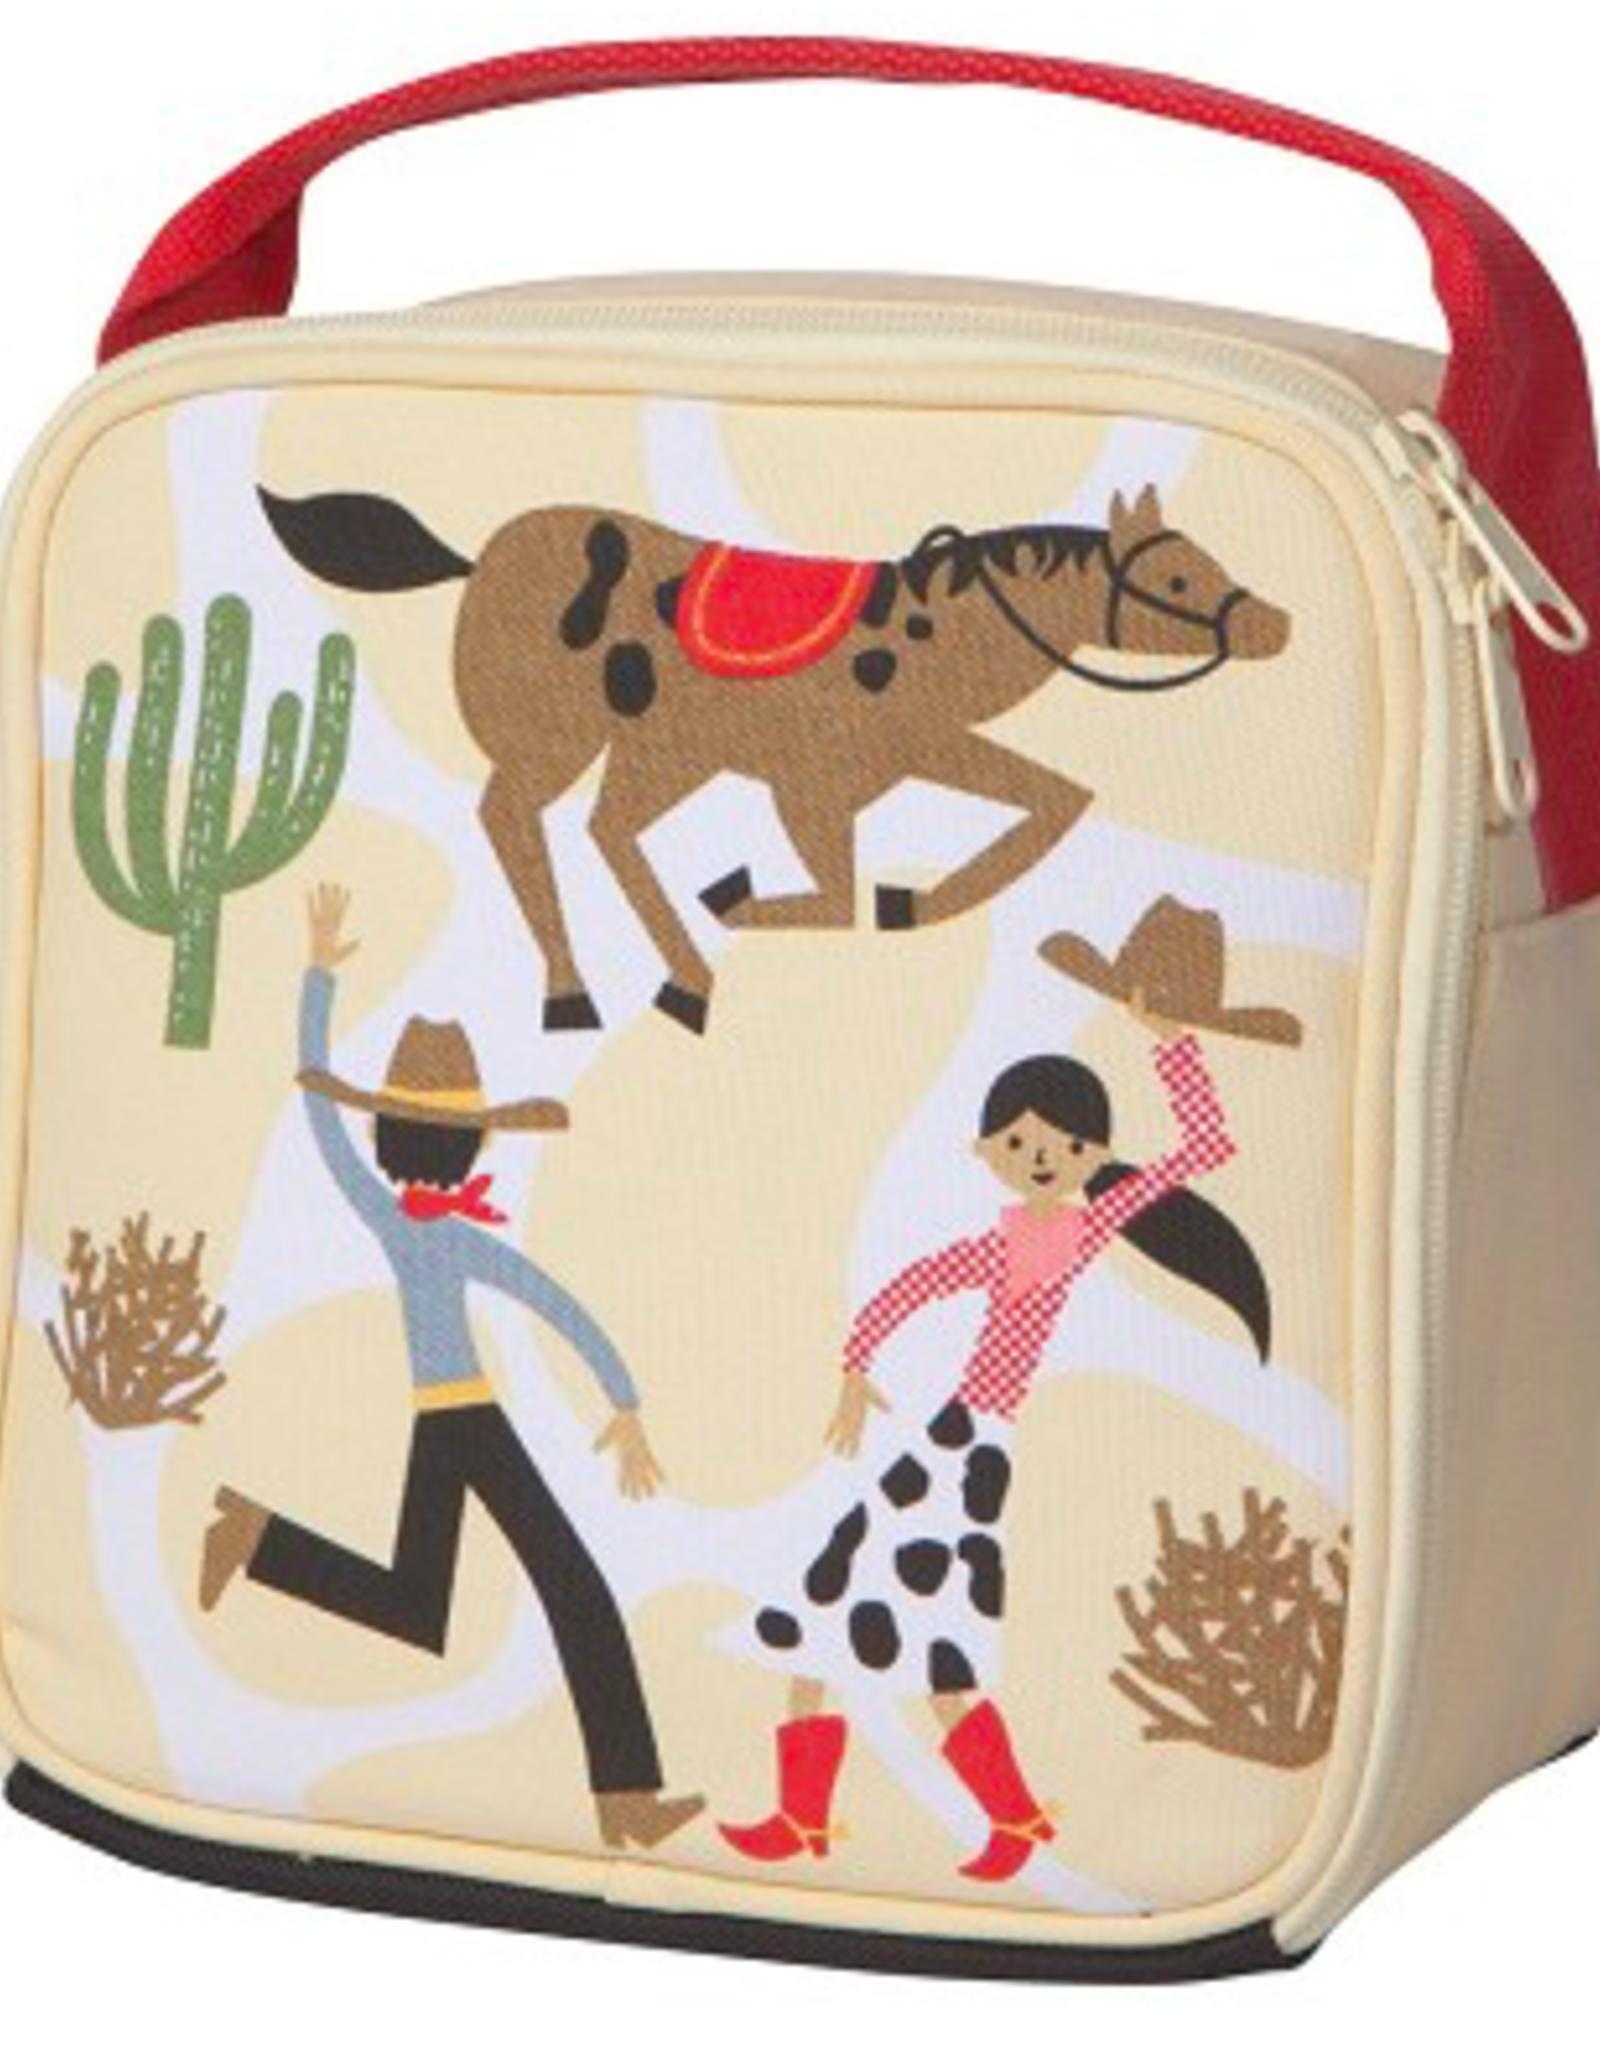 Danica Danica Rootin Tootin Lunch Bag